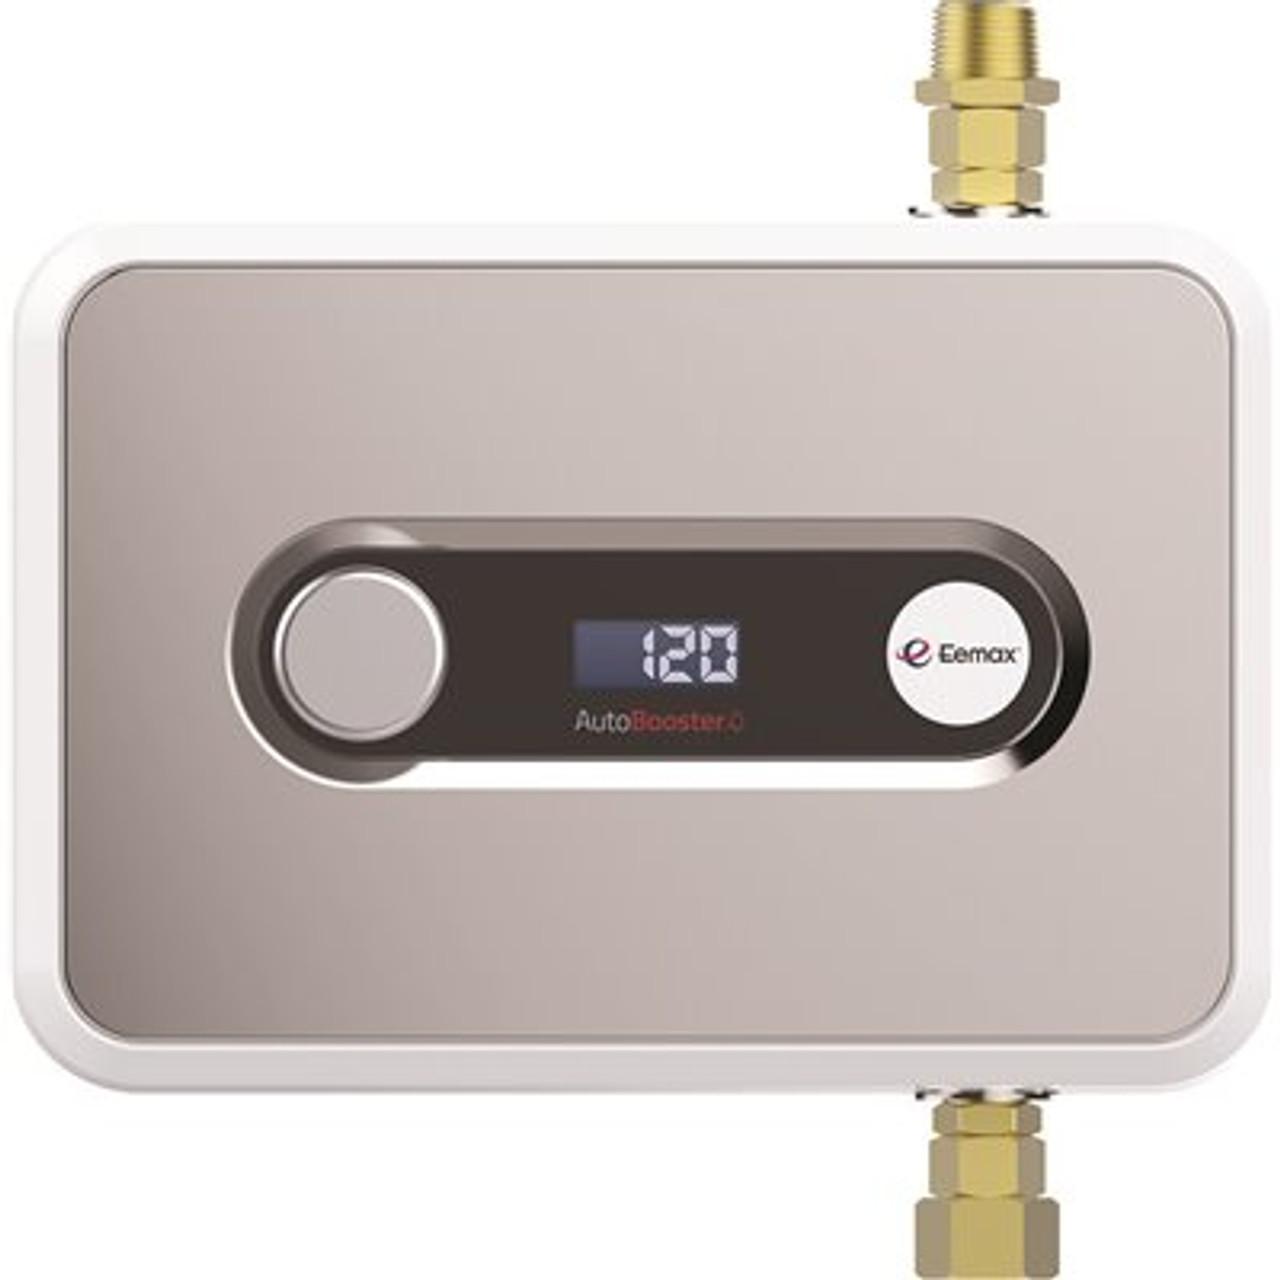 Eemax AutoBooster 7 kW Electric Water Heater Tank Booster - Item # 3569153, Eemax Part # HATB007240, UPC Code 091654920561